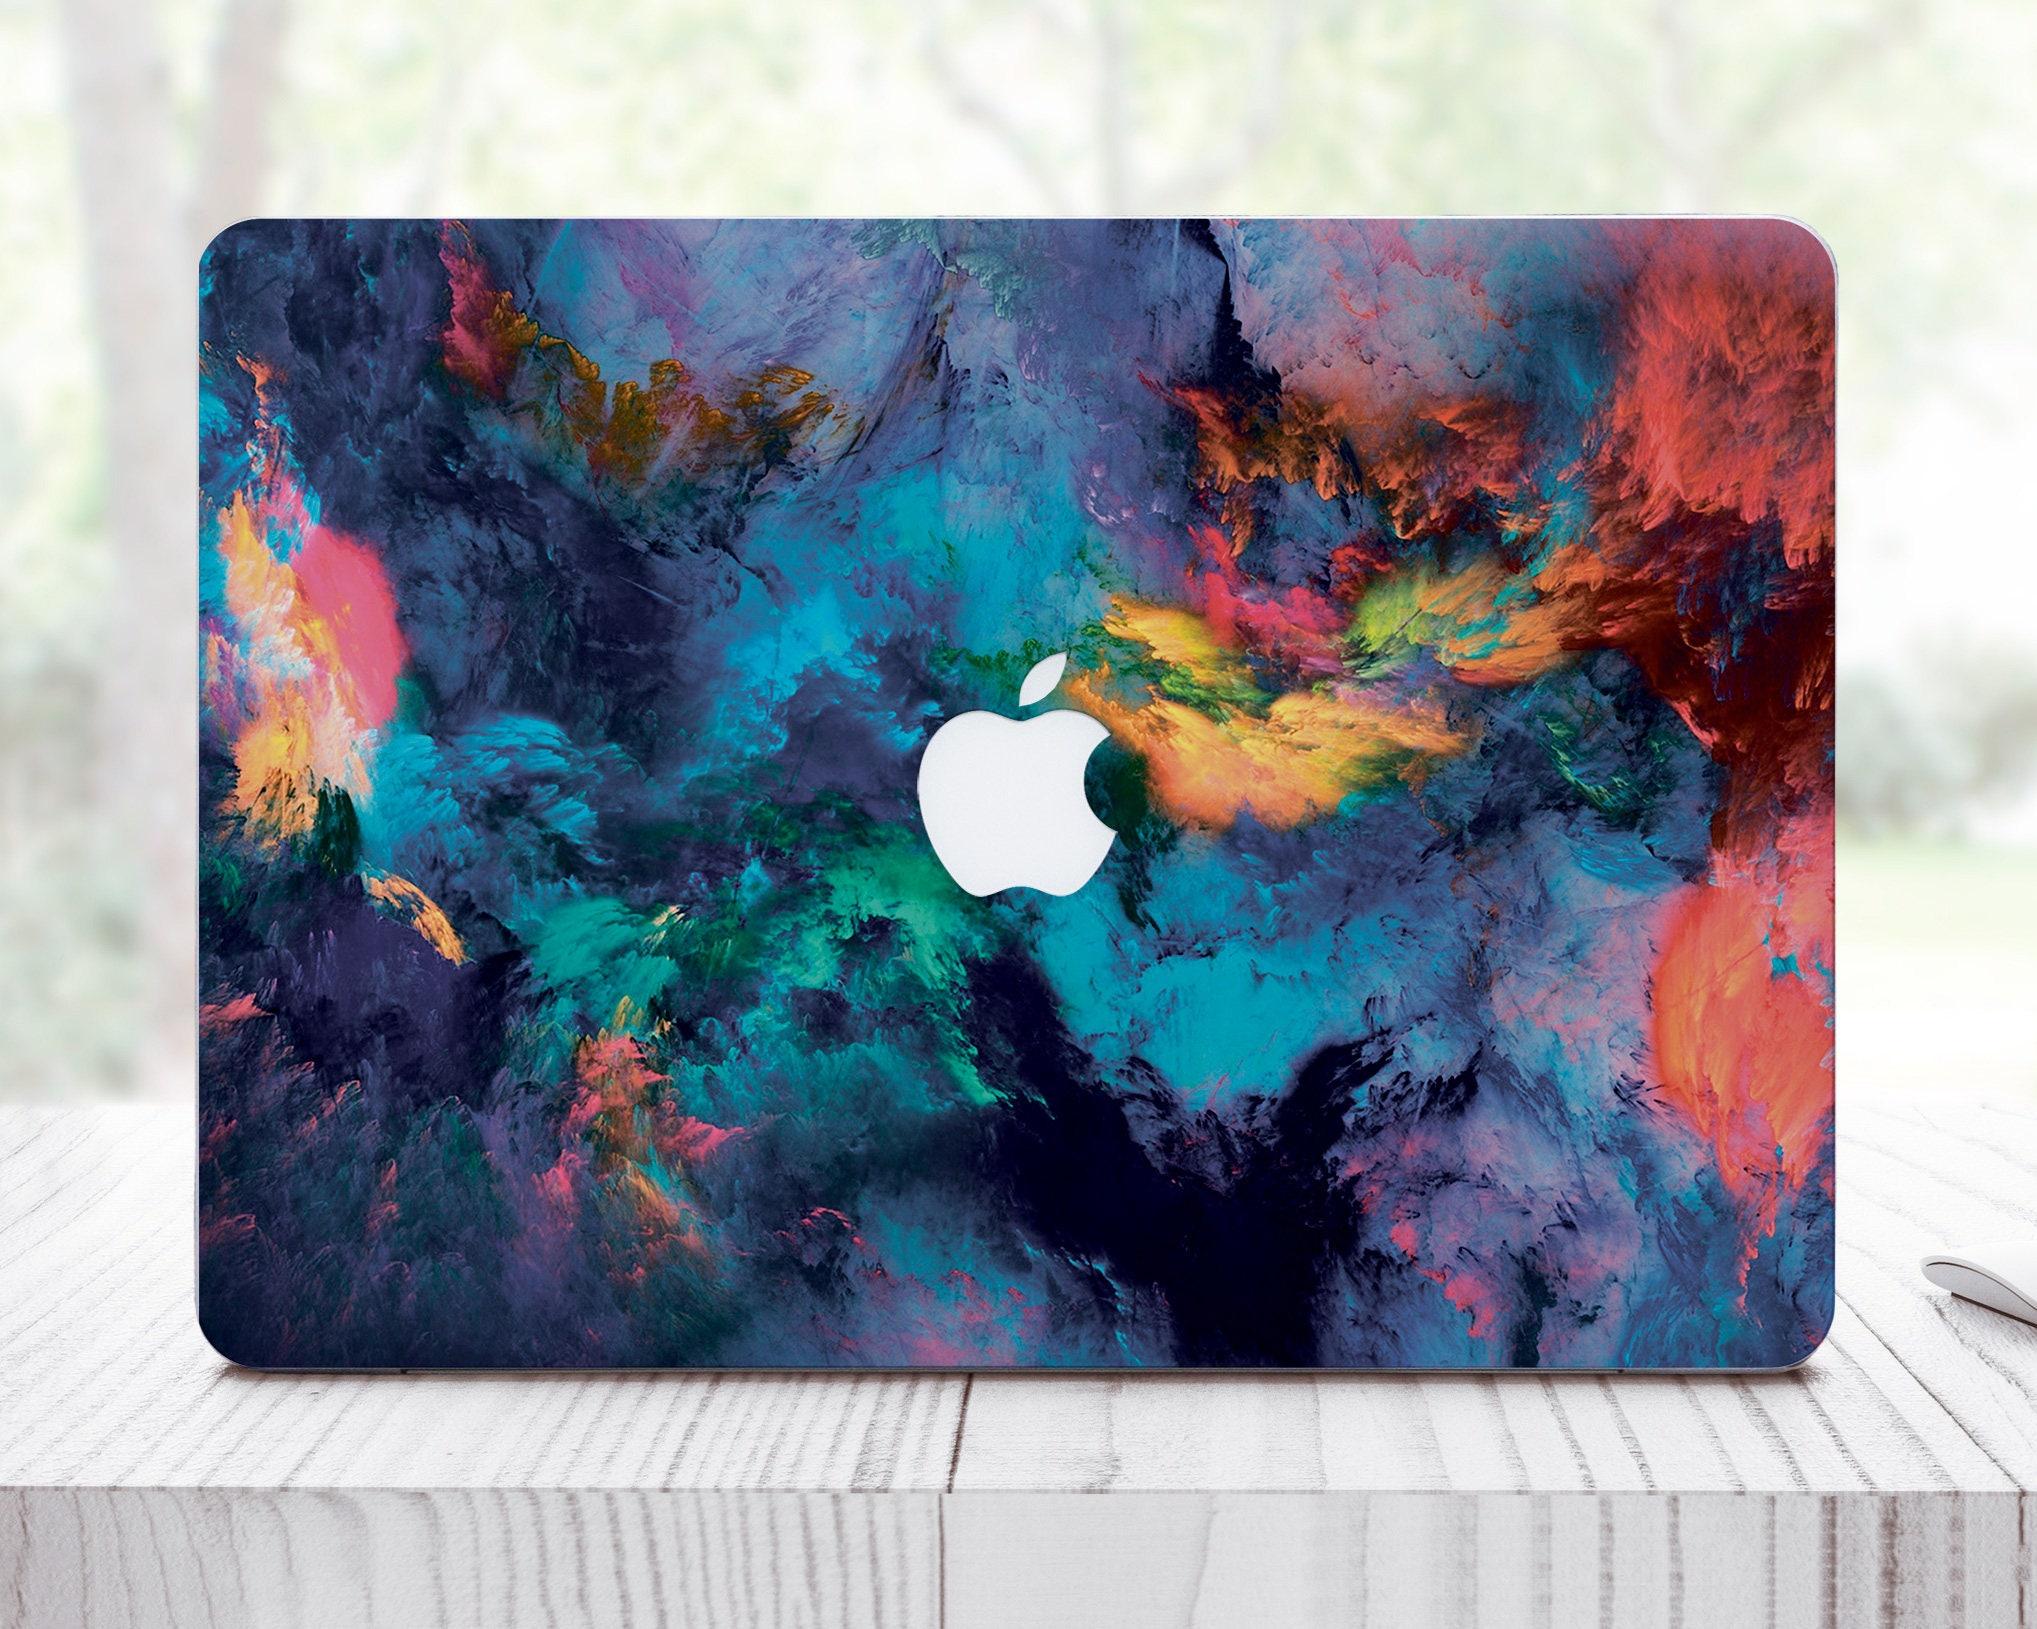 Painting  MacBook Pro Retina 15 Skin For MacBook Pro Retina MacBook Vinyl Decal MacBook 11 Vinyl Decal For MacBook Pro 15 Decal ES0011